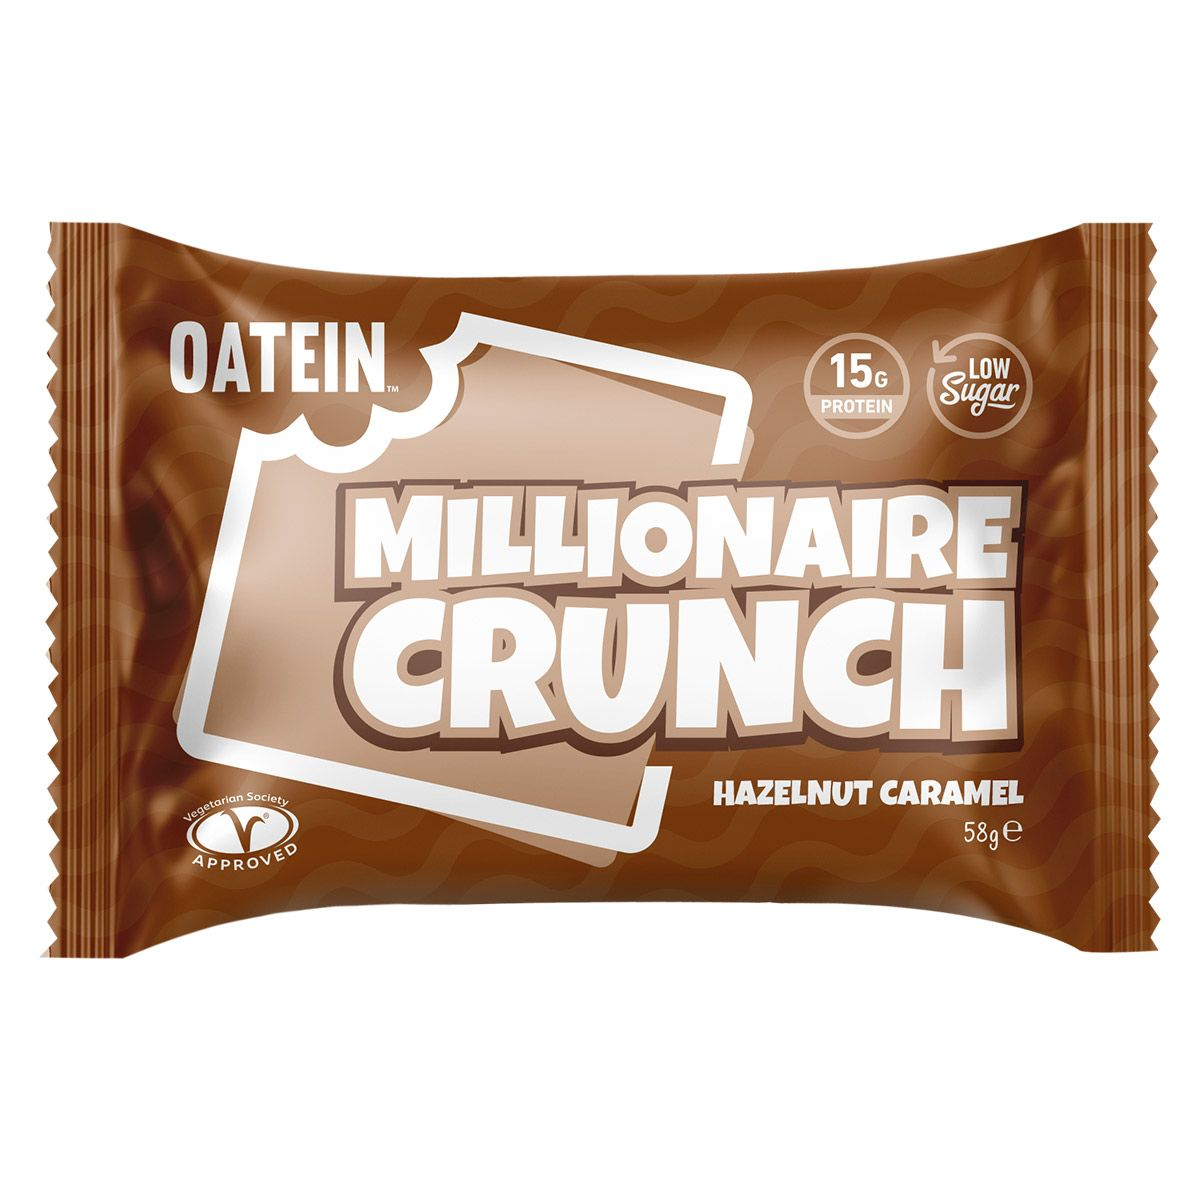 Oatein Millionaire Crunch - Hazelnut Caramel 58g